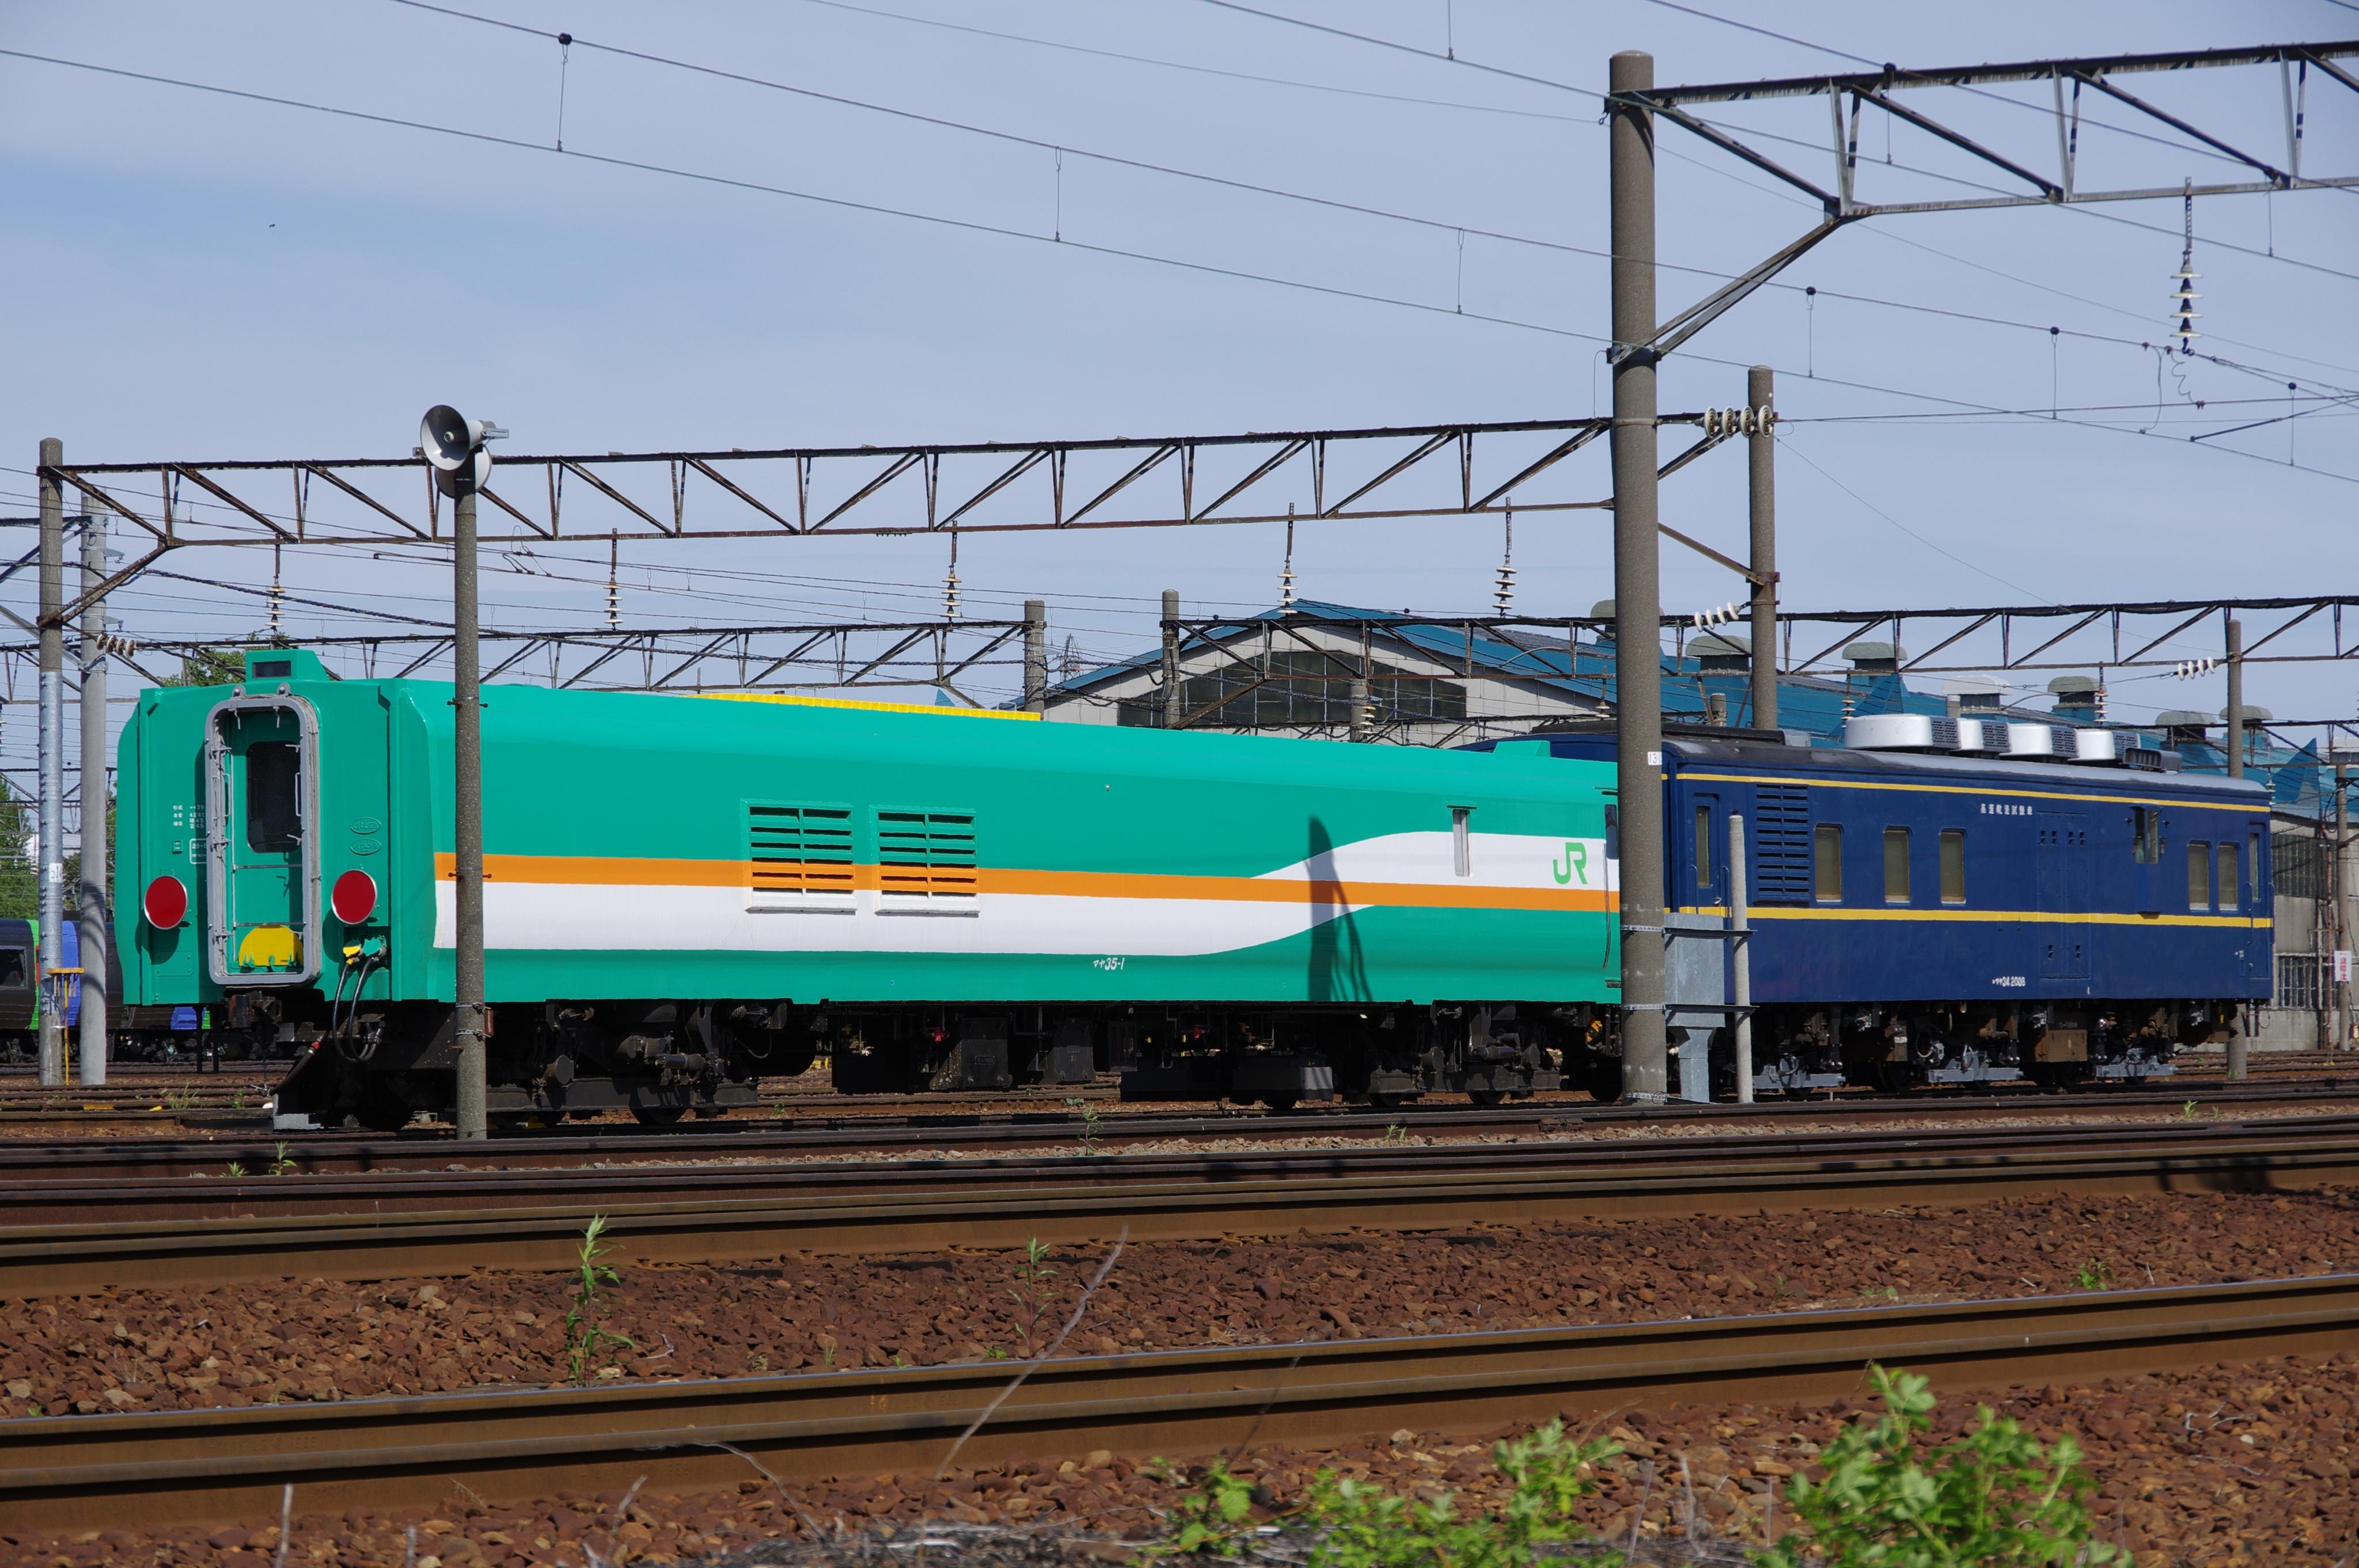 札幌運転所 マヤ34-2008+35-1_180524 (3).jpg